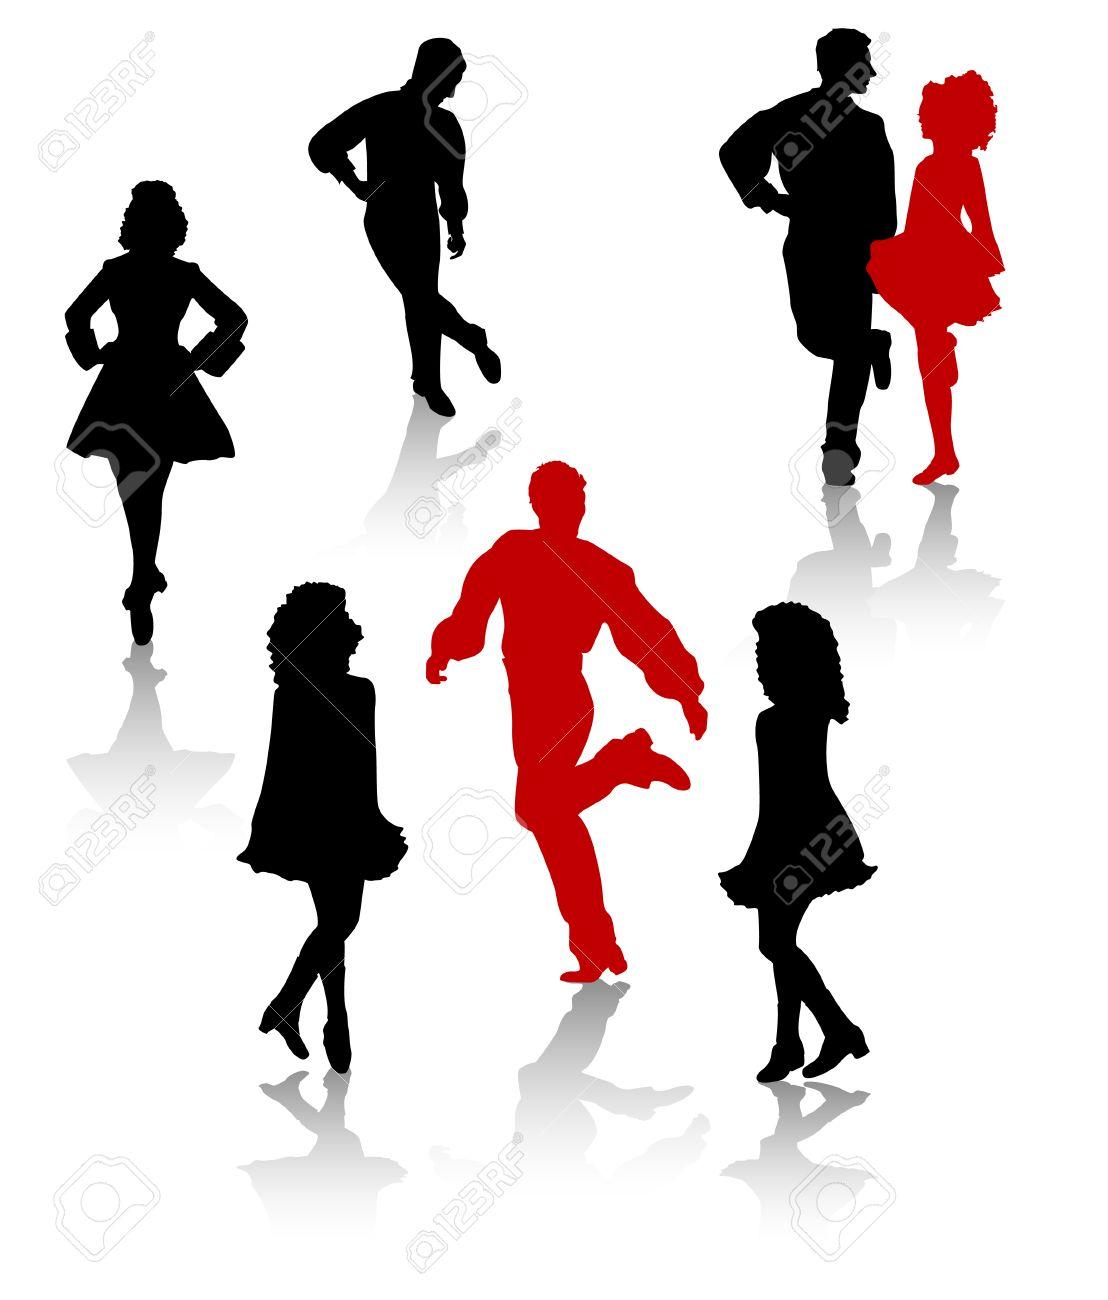 Dancers silhouette of national folk dance of Ireland. Stock Vector - 4074745